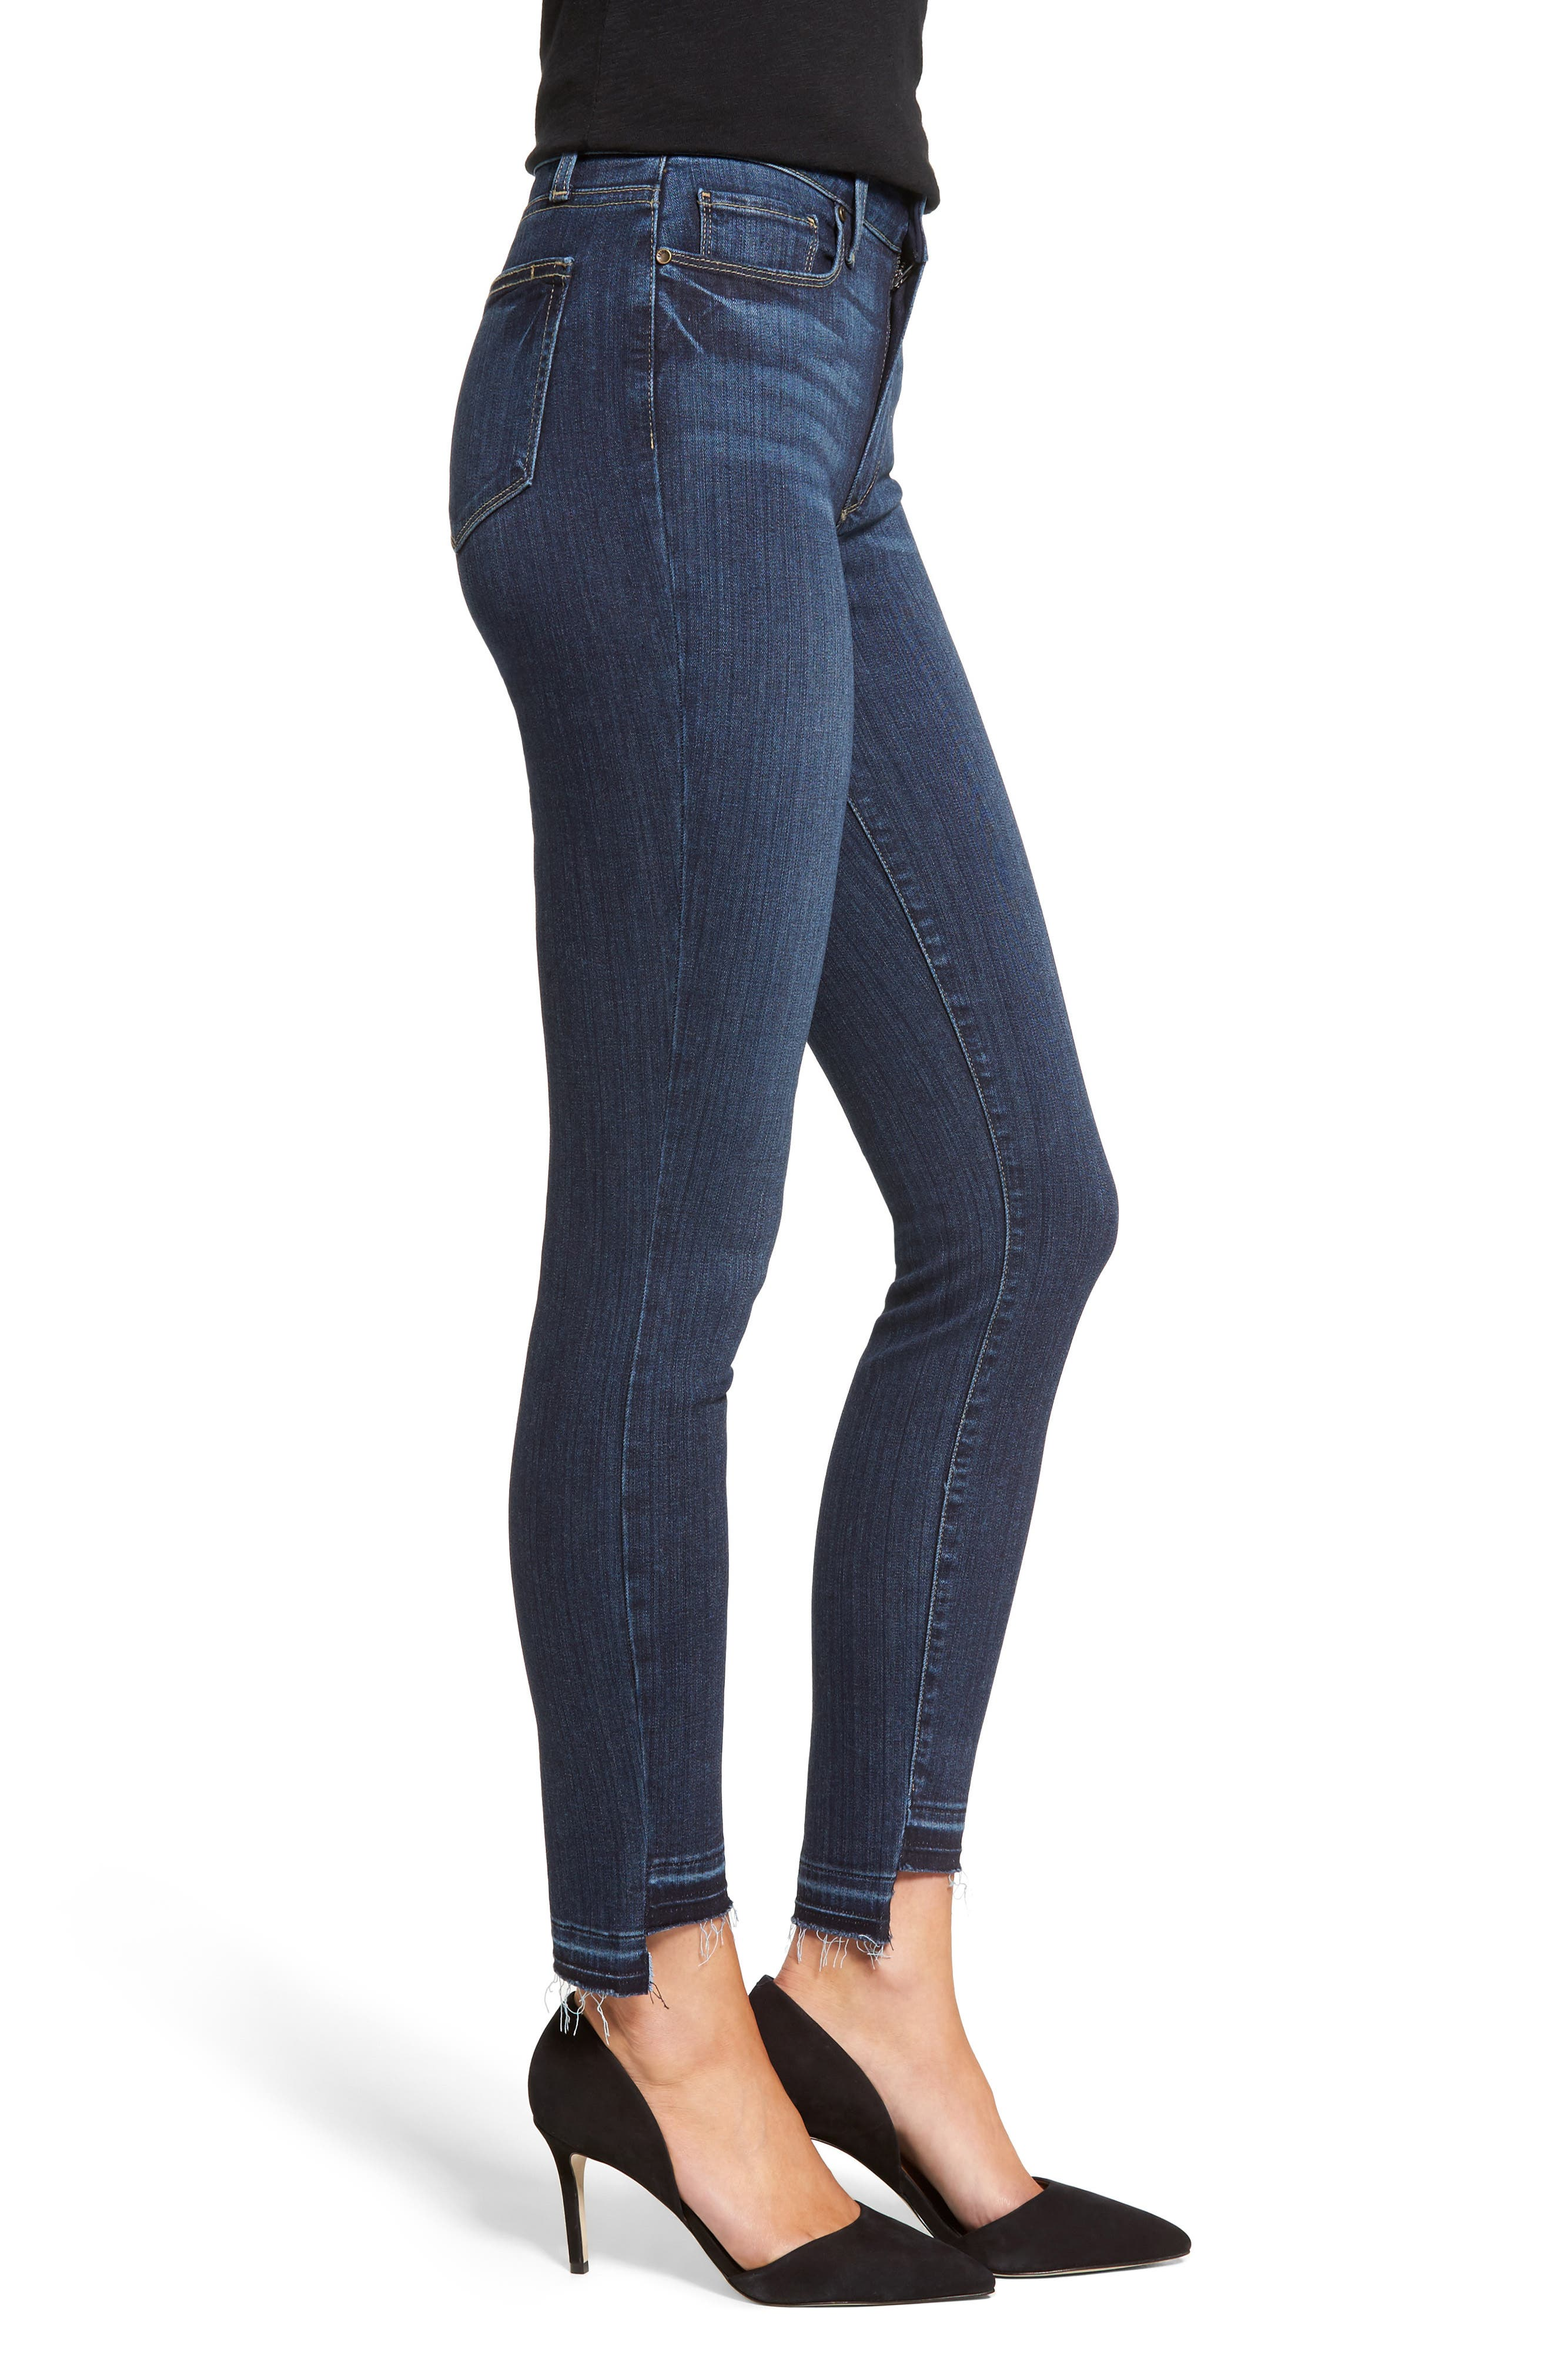 PAIGE, Hoxton High Waist Skinny Jeans, Alternate thumbnail 3, color, 400